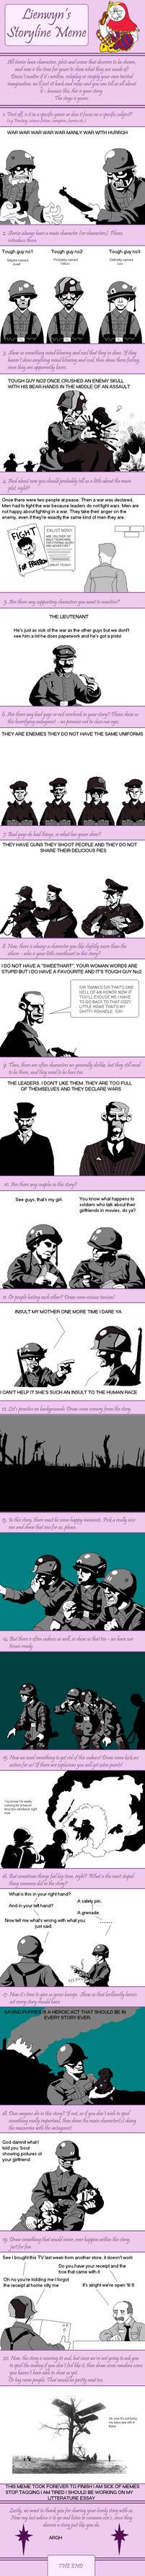 Storyline Meme by AngusMcLeod